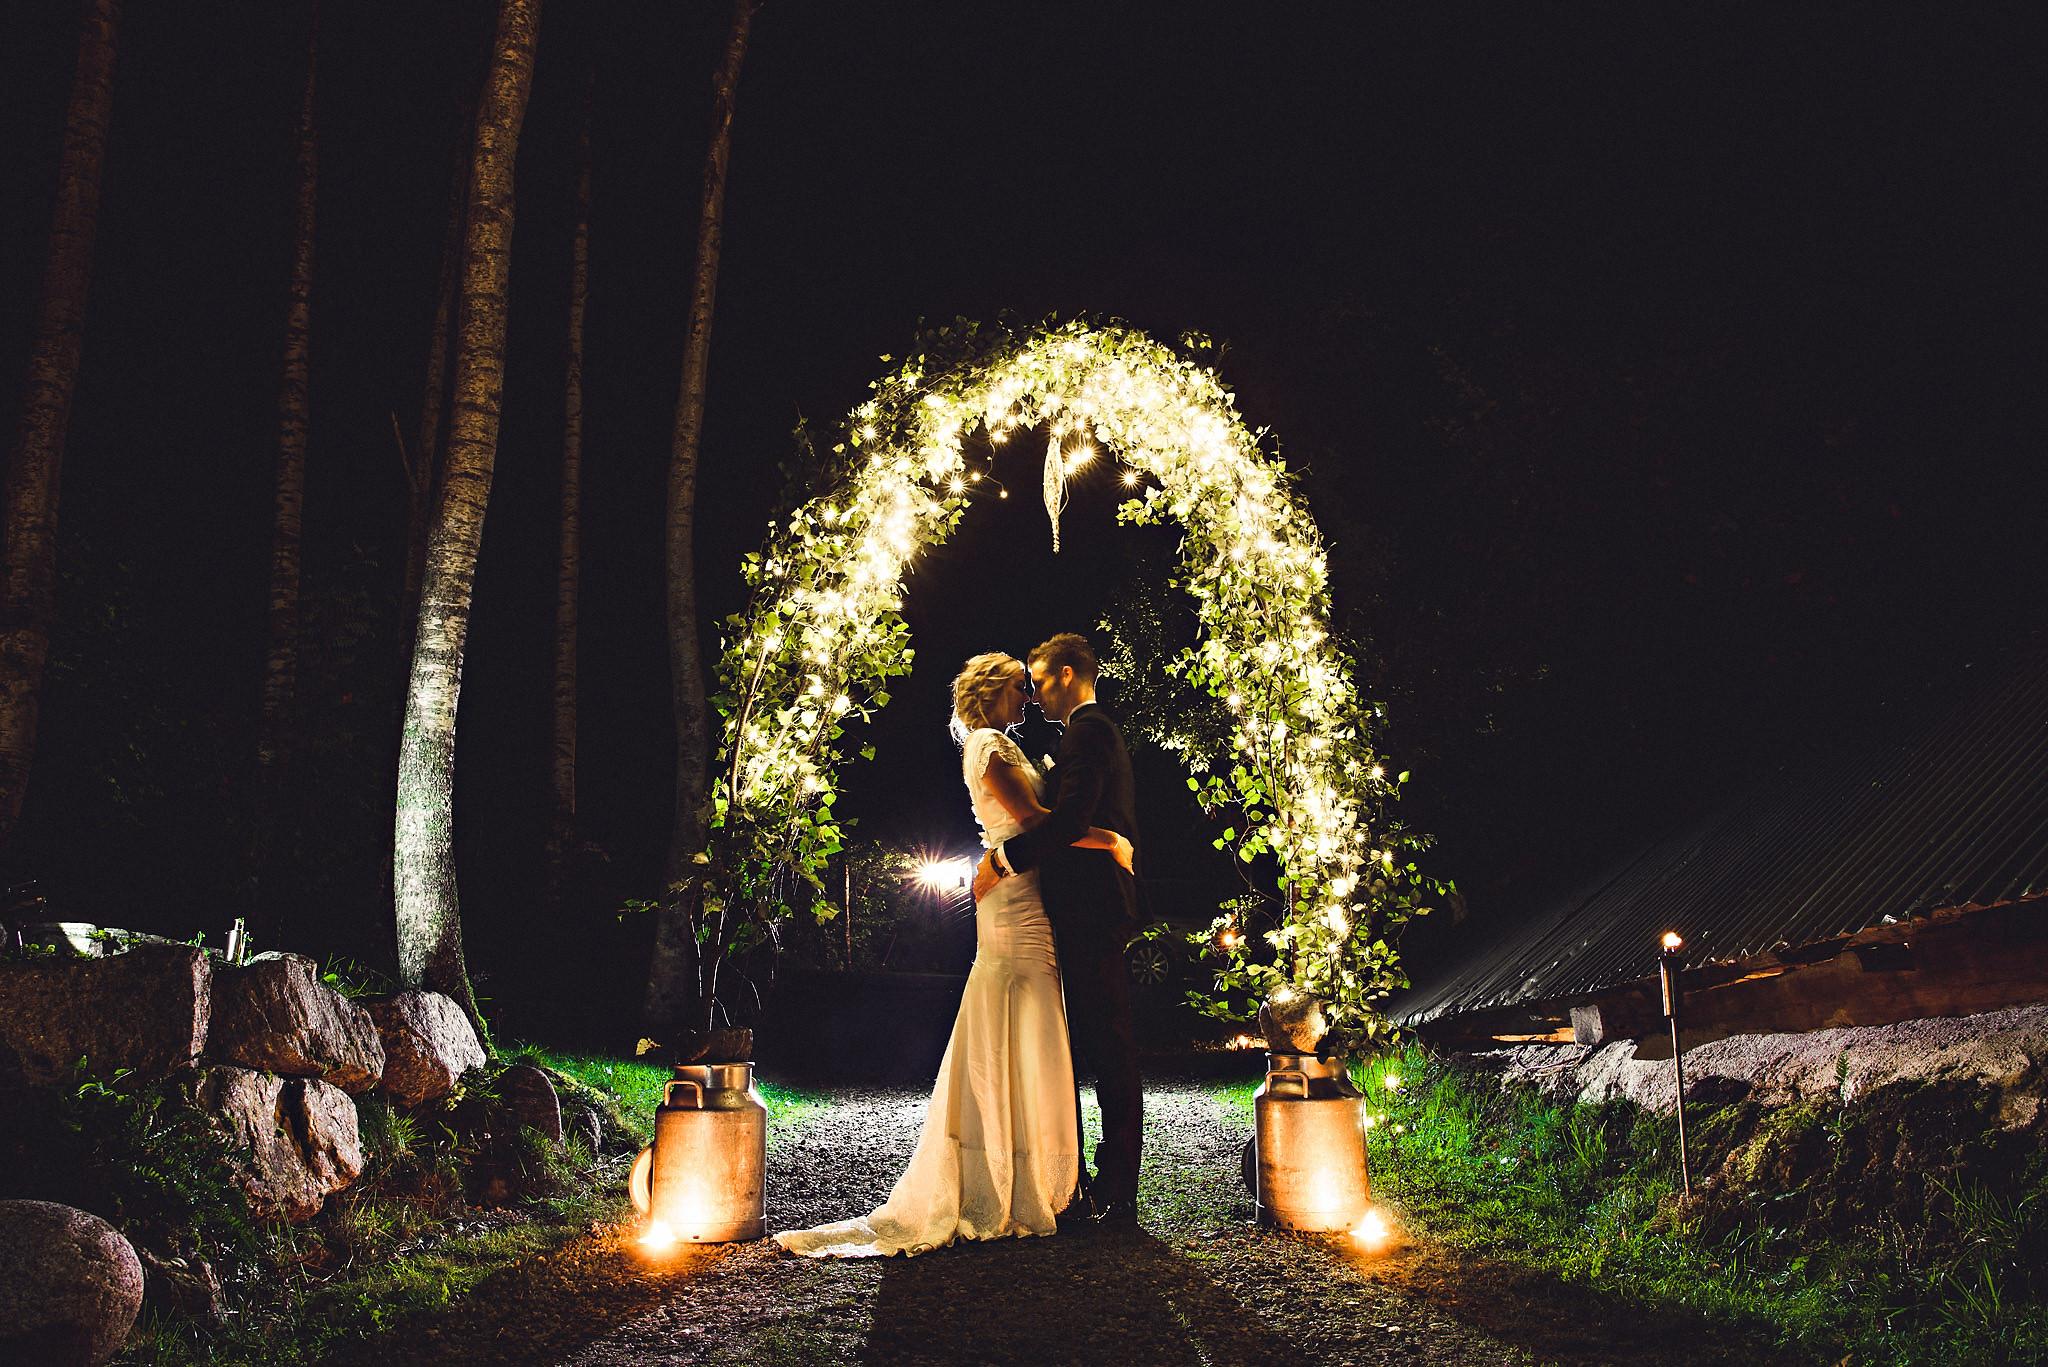 Bryllup på Yrineset i Oldedalen bryllupsfotograf sogn og fjordane-47.jpg